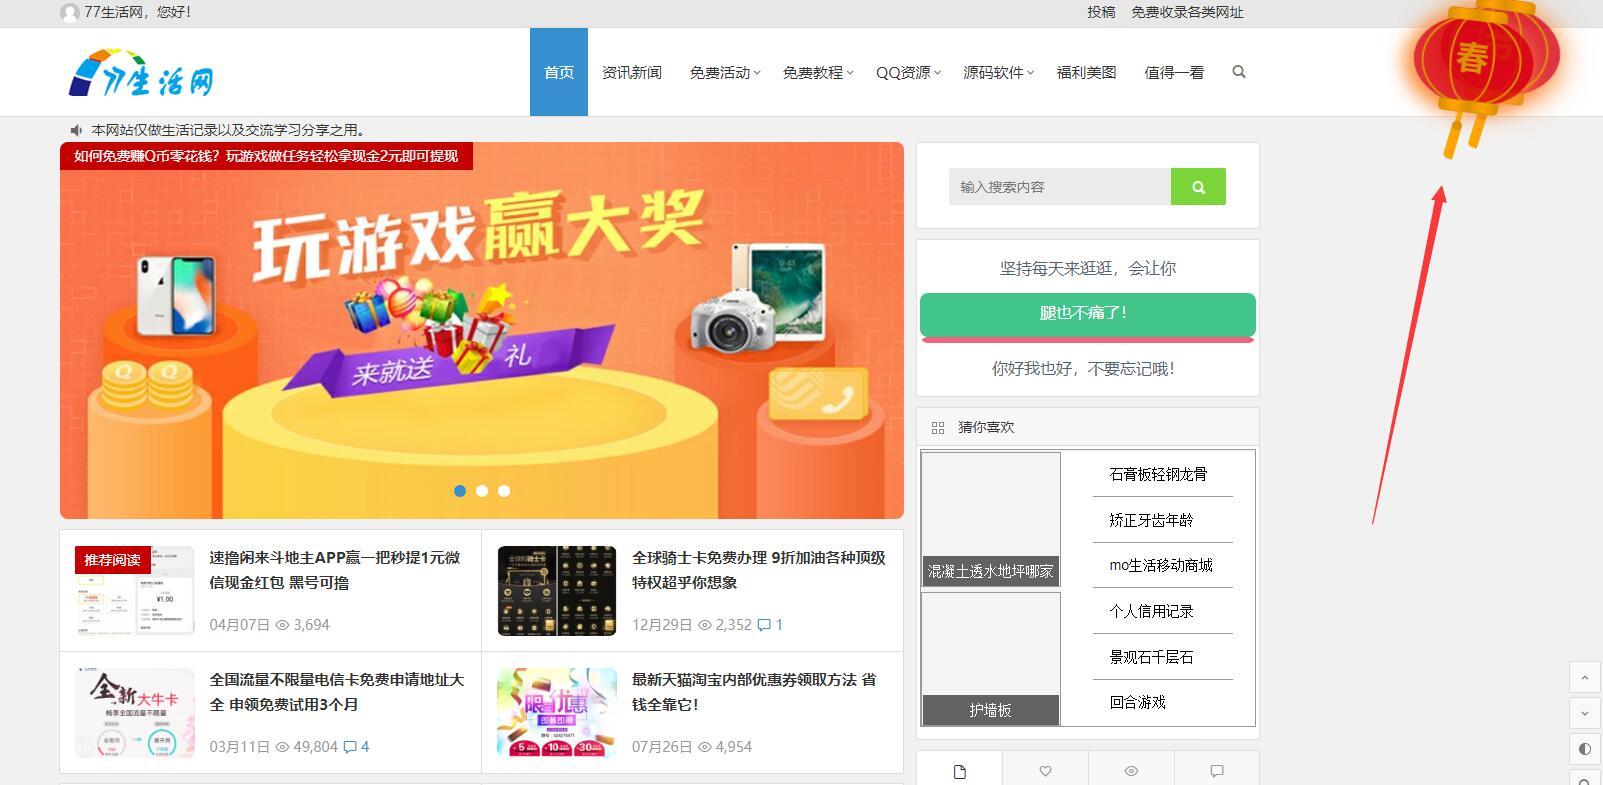 wordpress网站添加动态春节灯笼方法以及代码